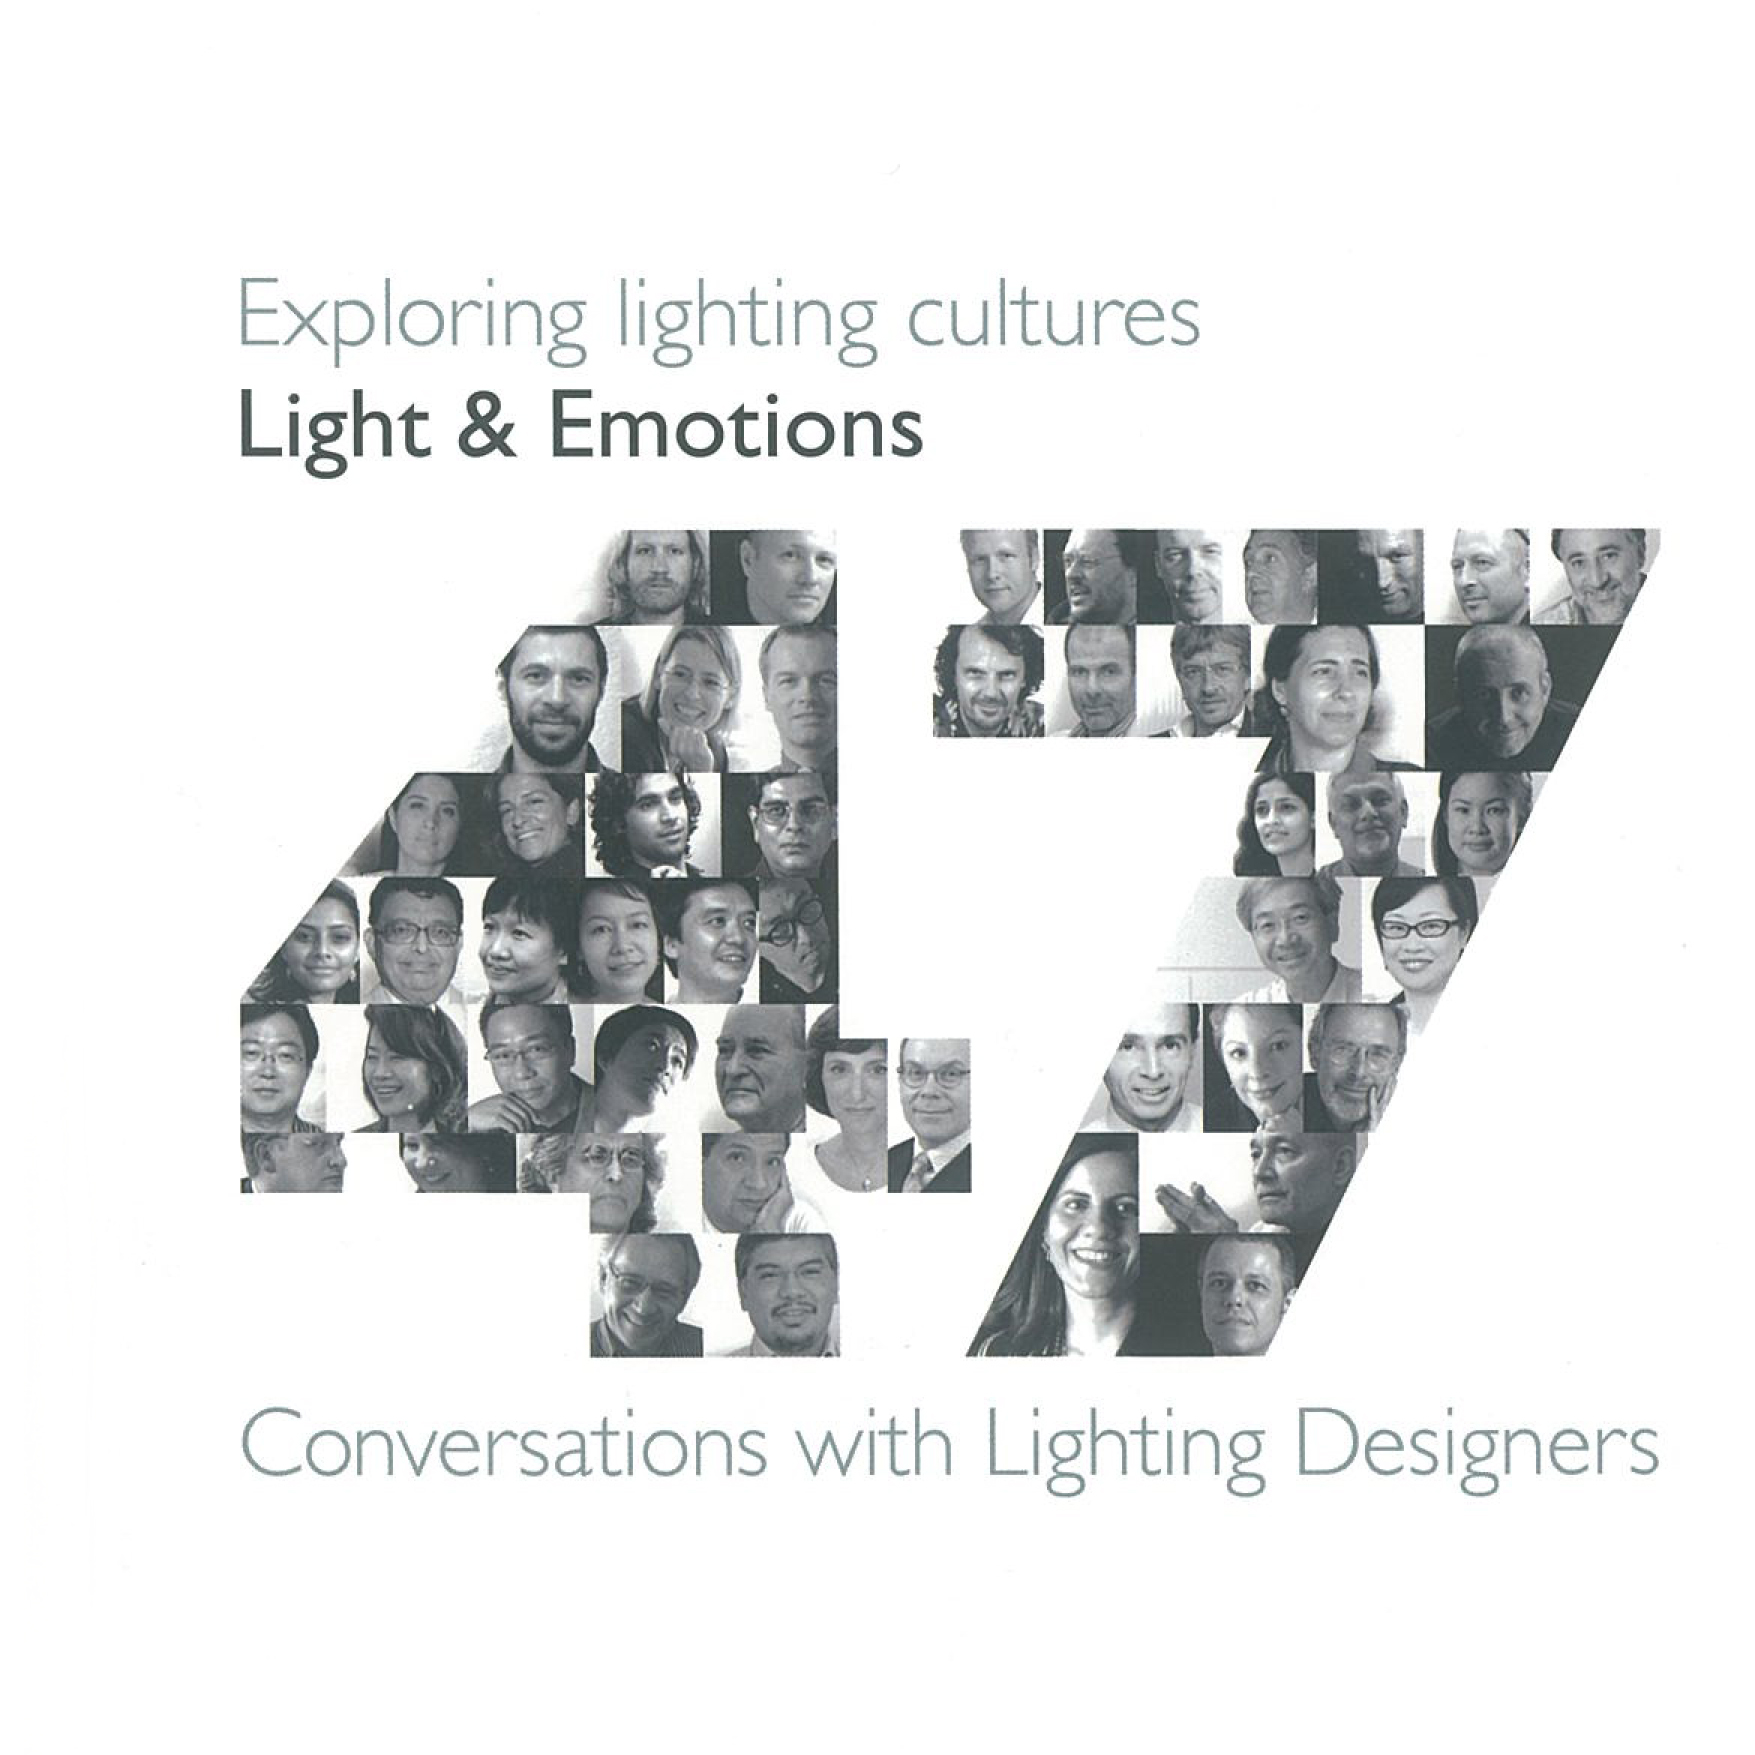 2009 LIGHT & EMOTIONS - PHILIPS